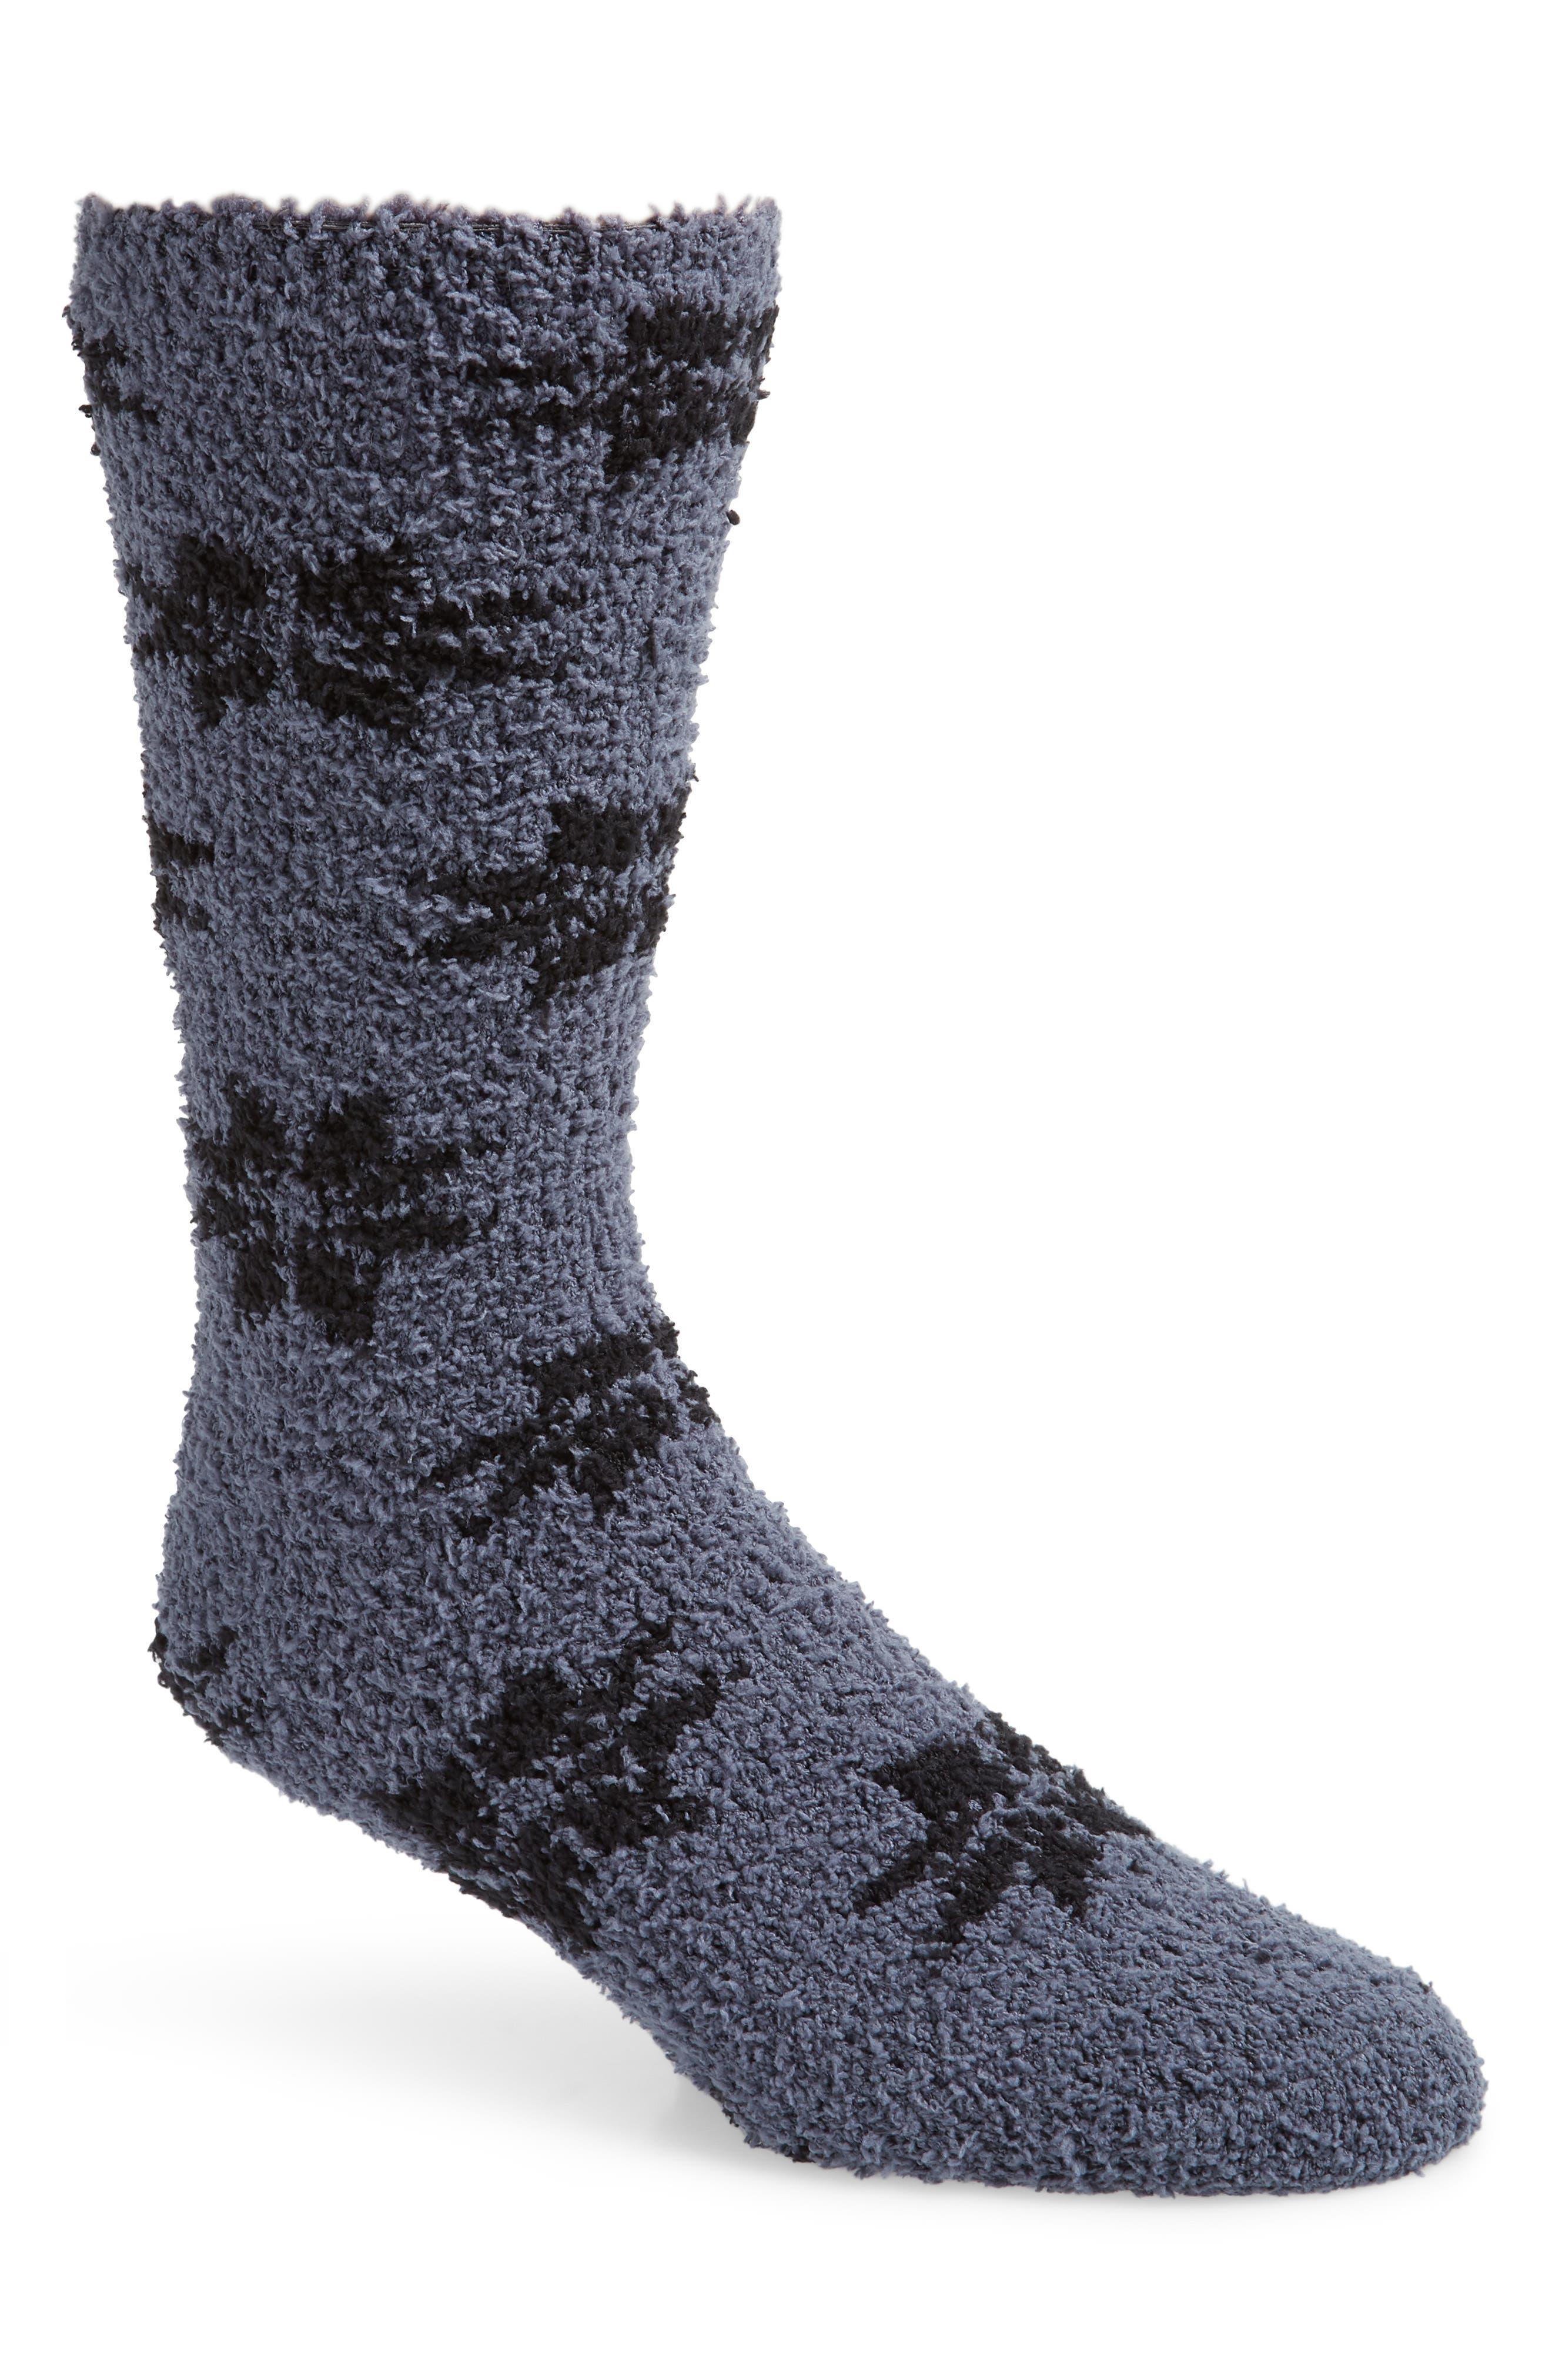 Butter Socks,                             Main thumbnail 1, color,                             021